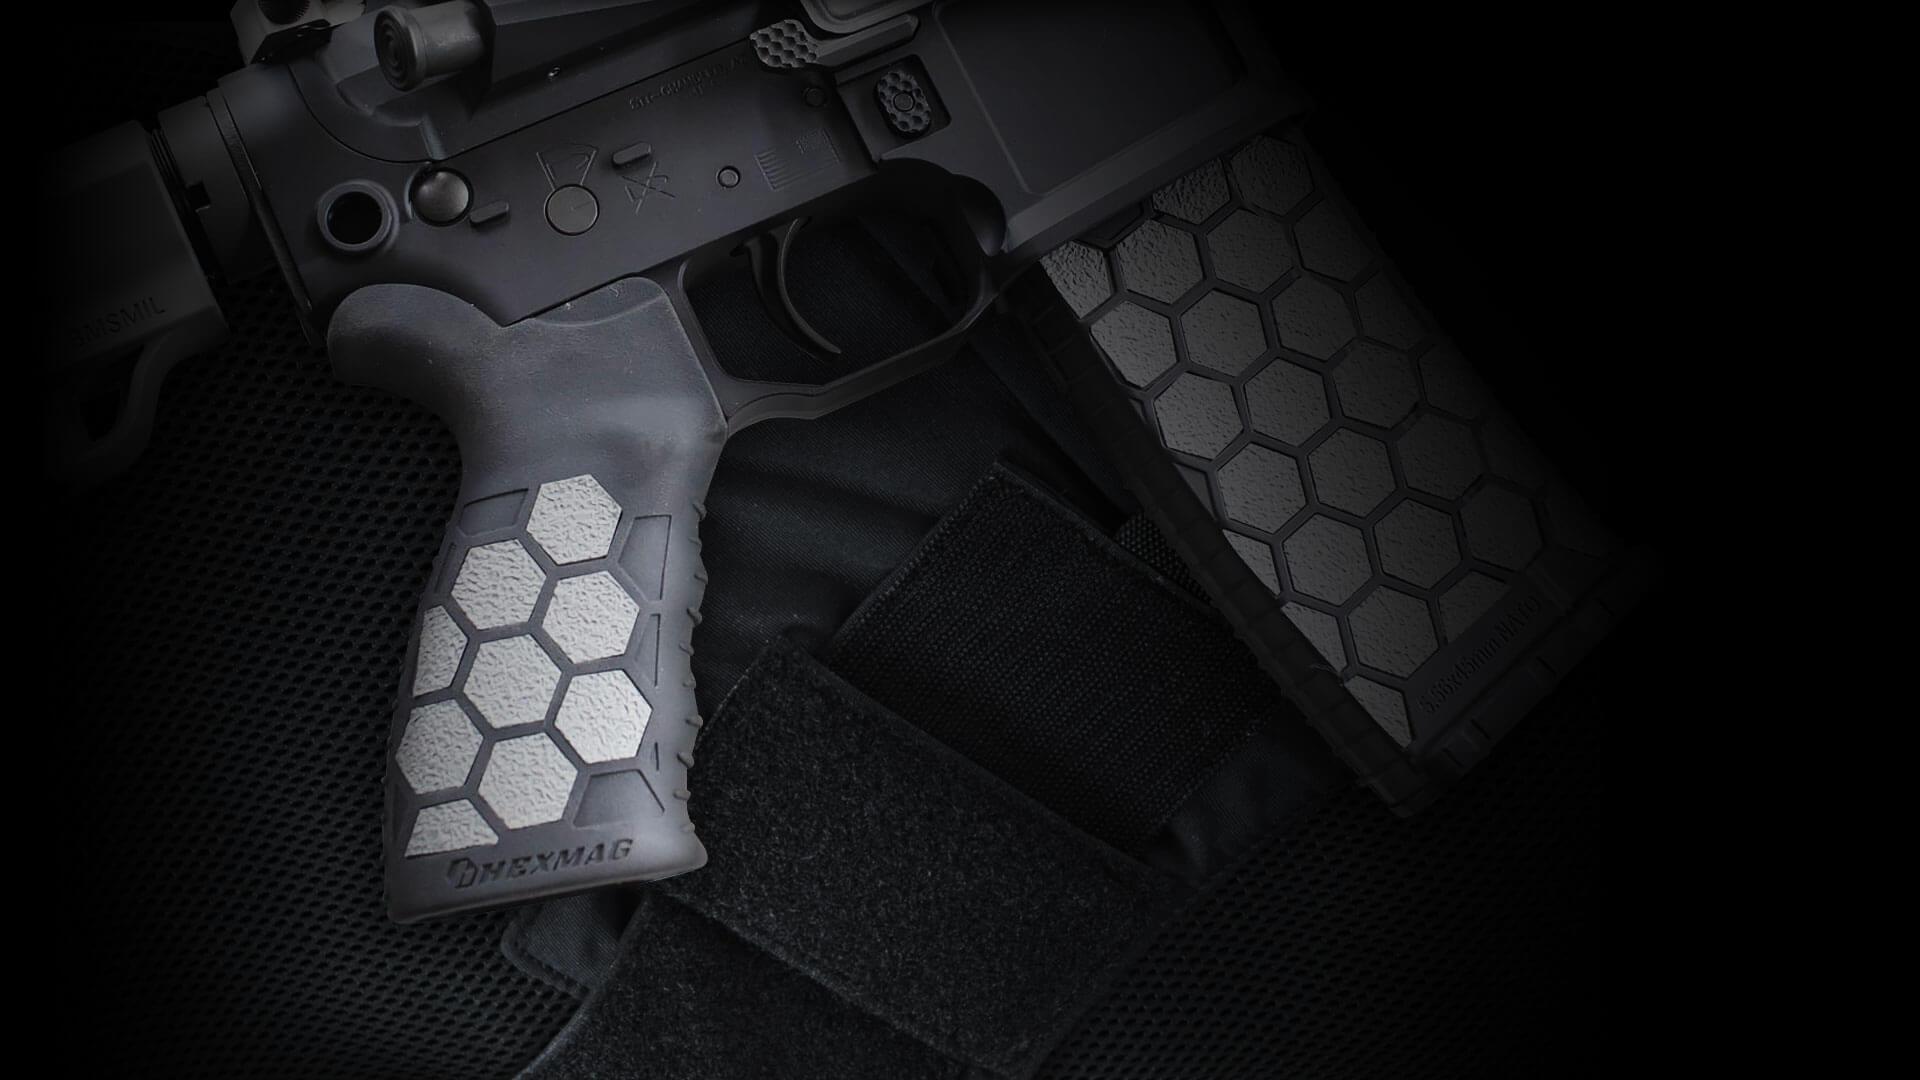 Hexmag Tactical Grips – Best Gun Grips for Sale – Hexmag